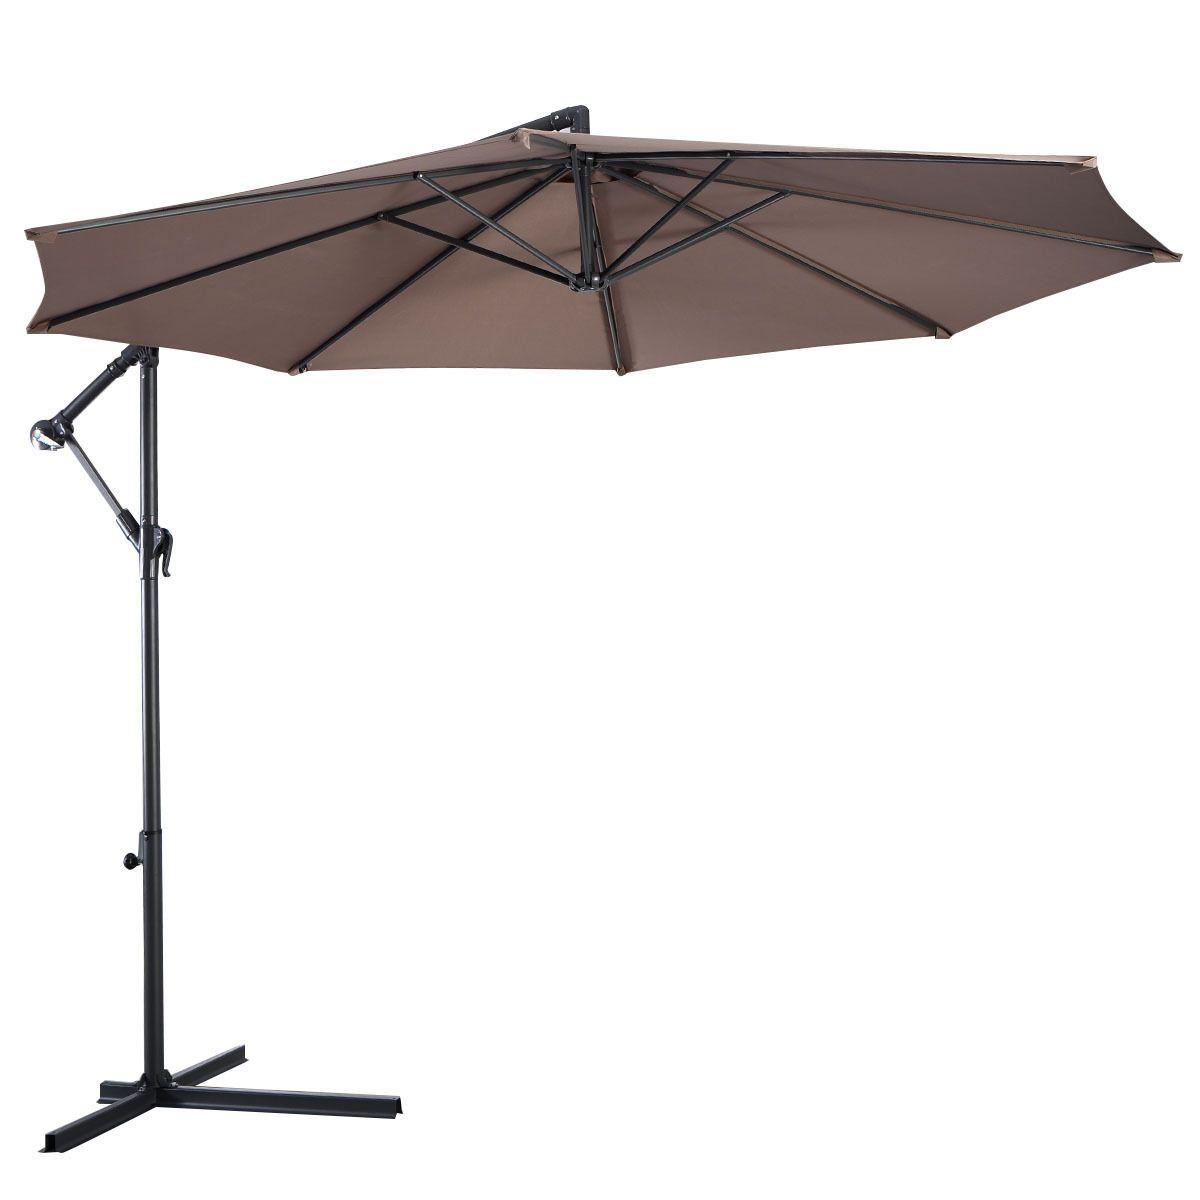 10 Ft Hanging Umbrella Patio Sun Shade Offset Outdoor Market W